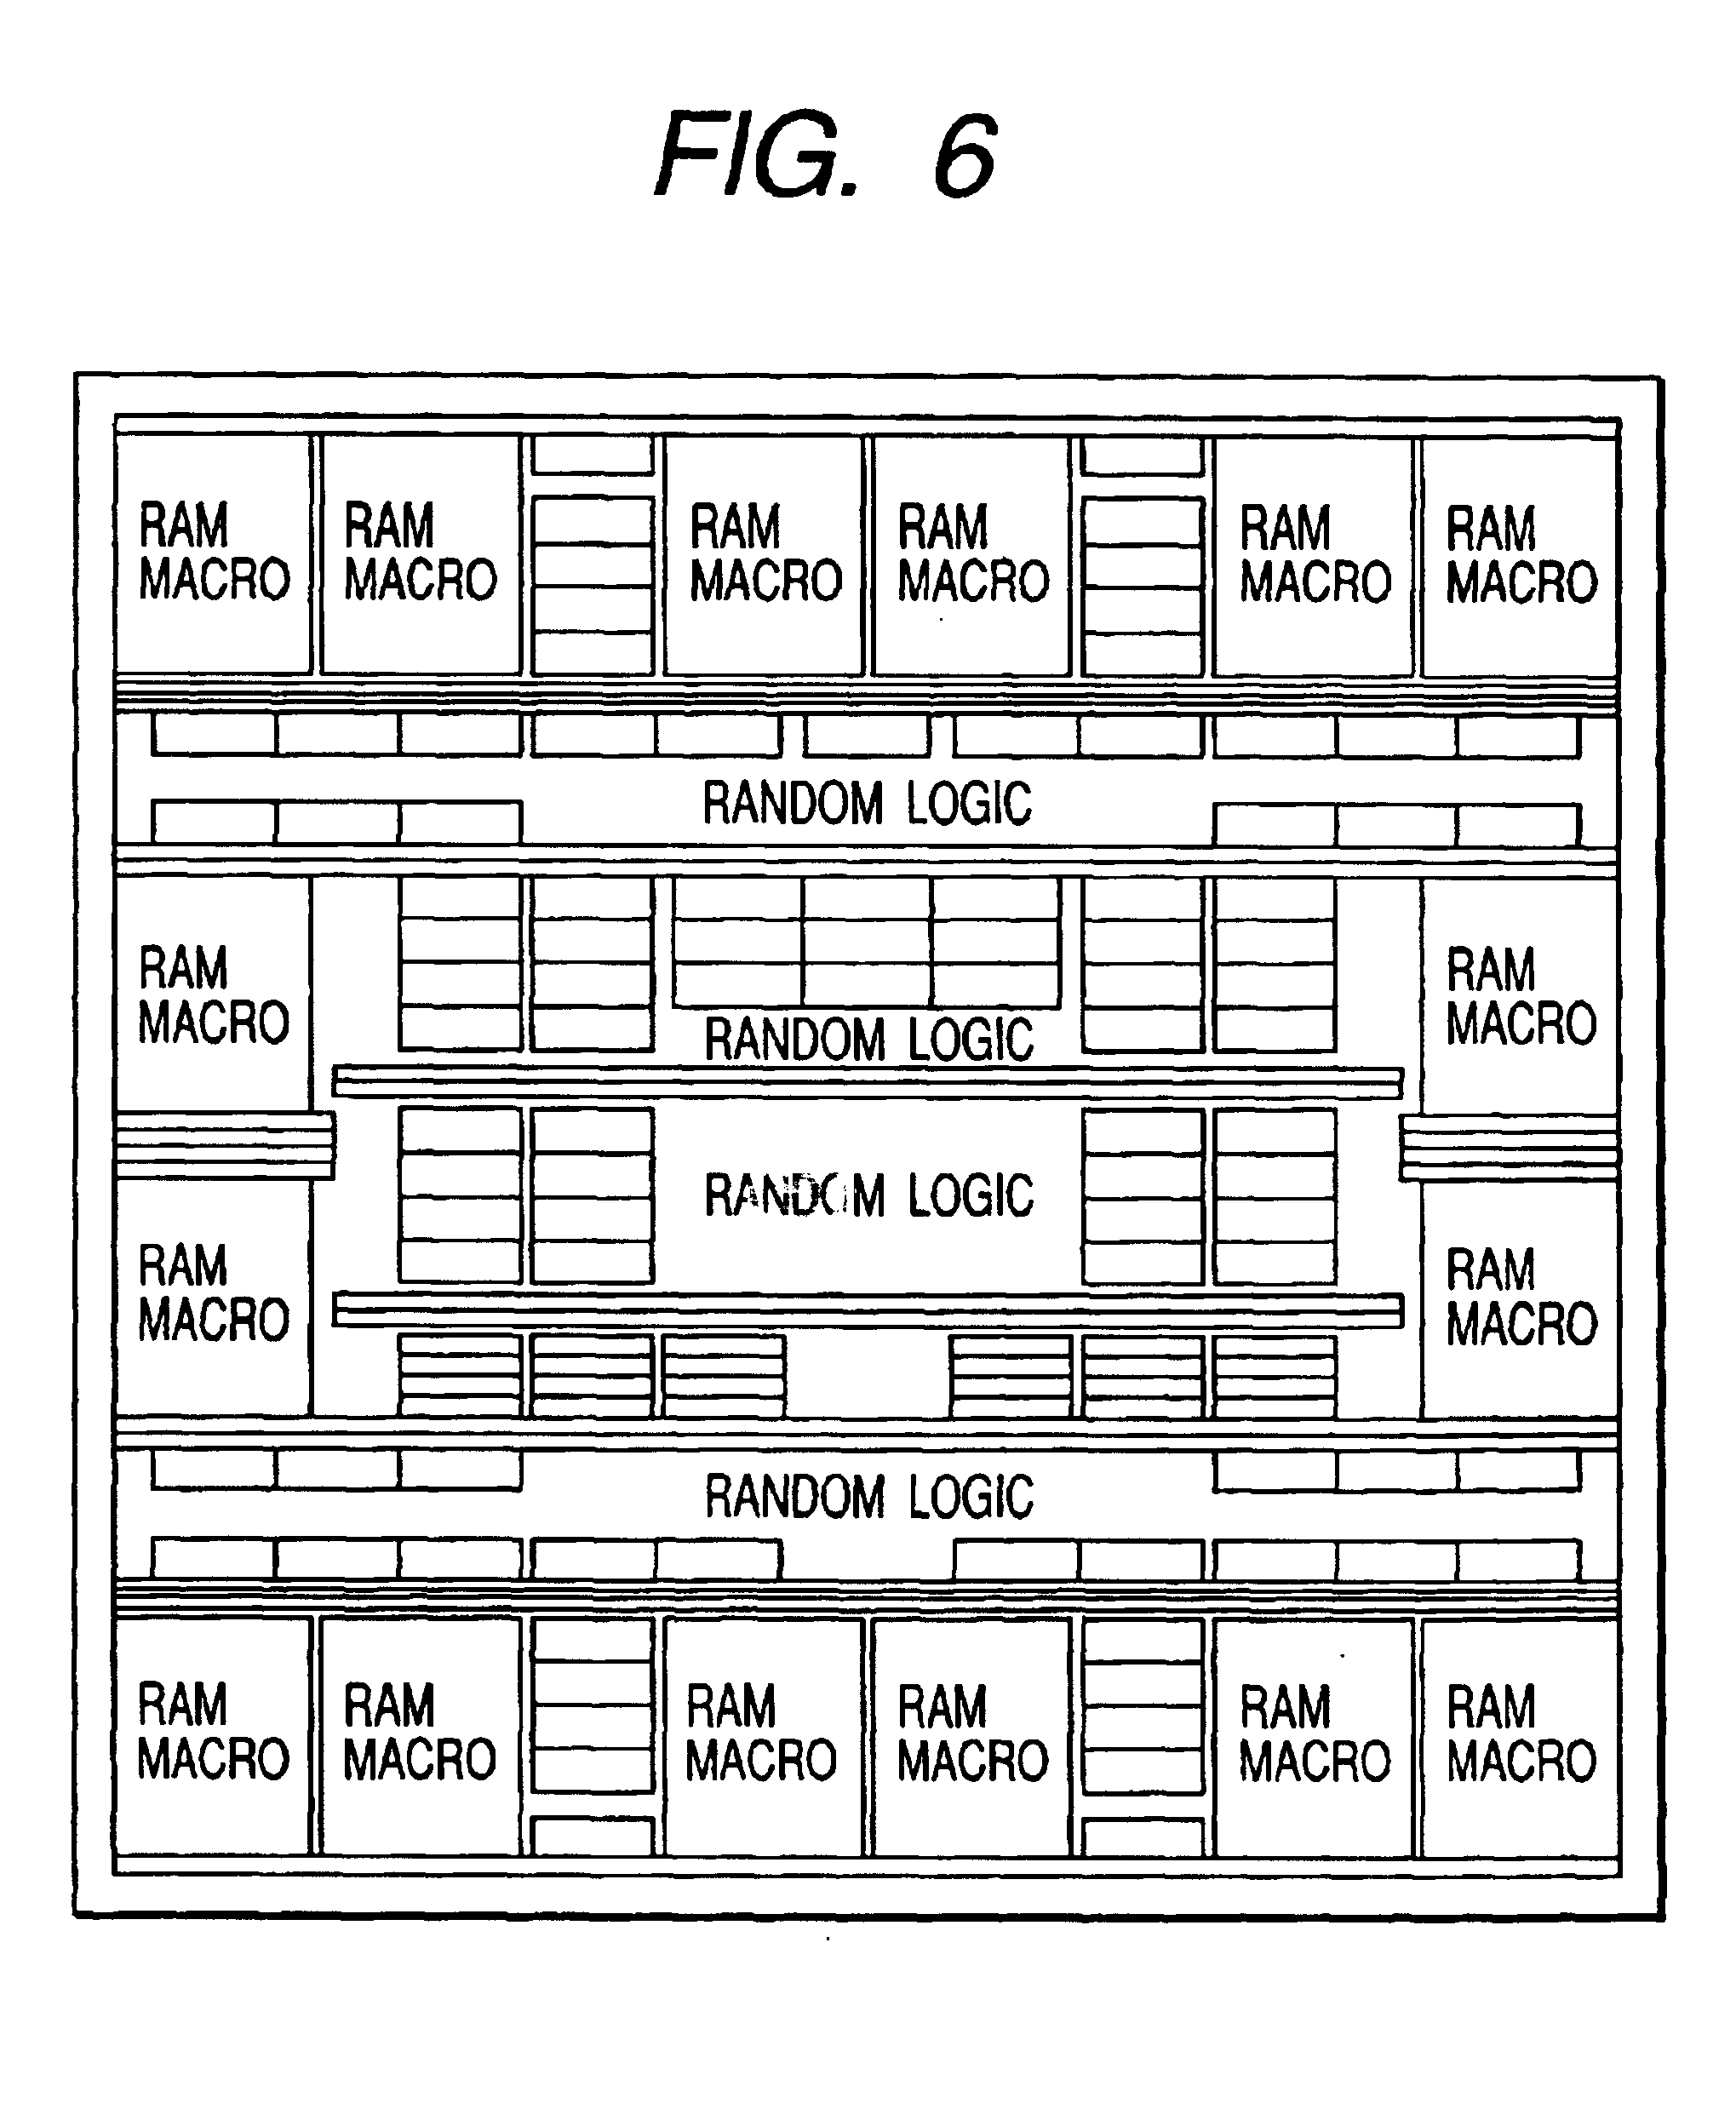 Patente Us6727532 Semiconductor Integrated Circuit Device Google Logic Diagram 4 X 3 Memory Patent Drawing